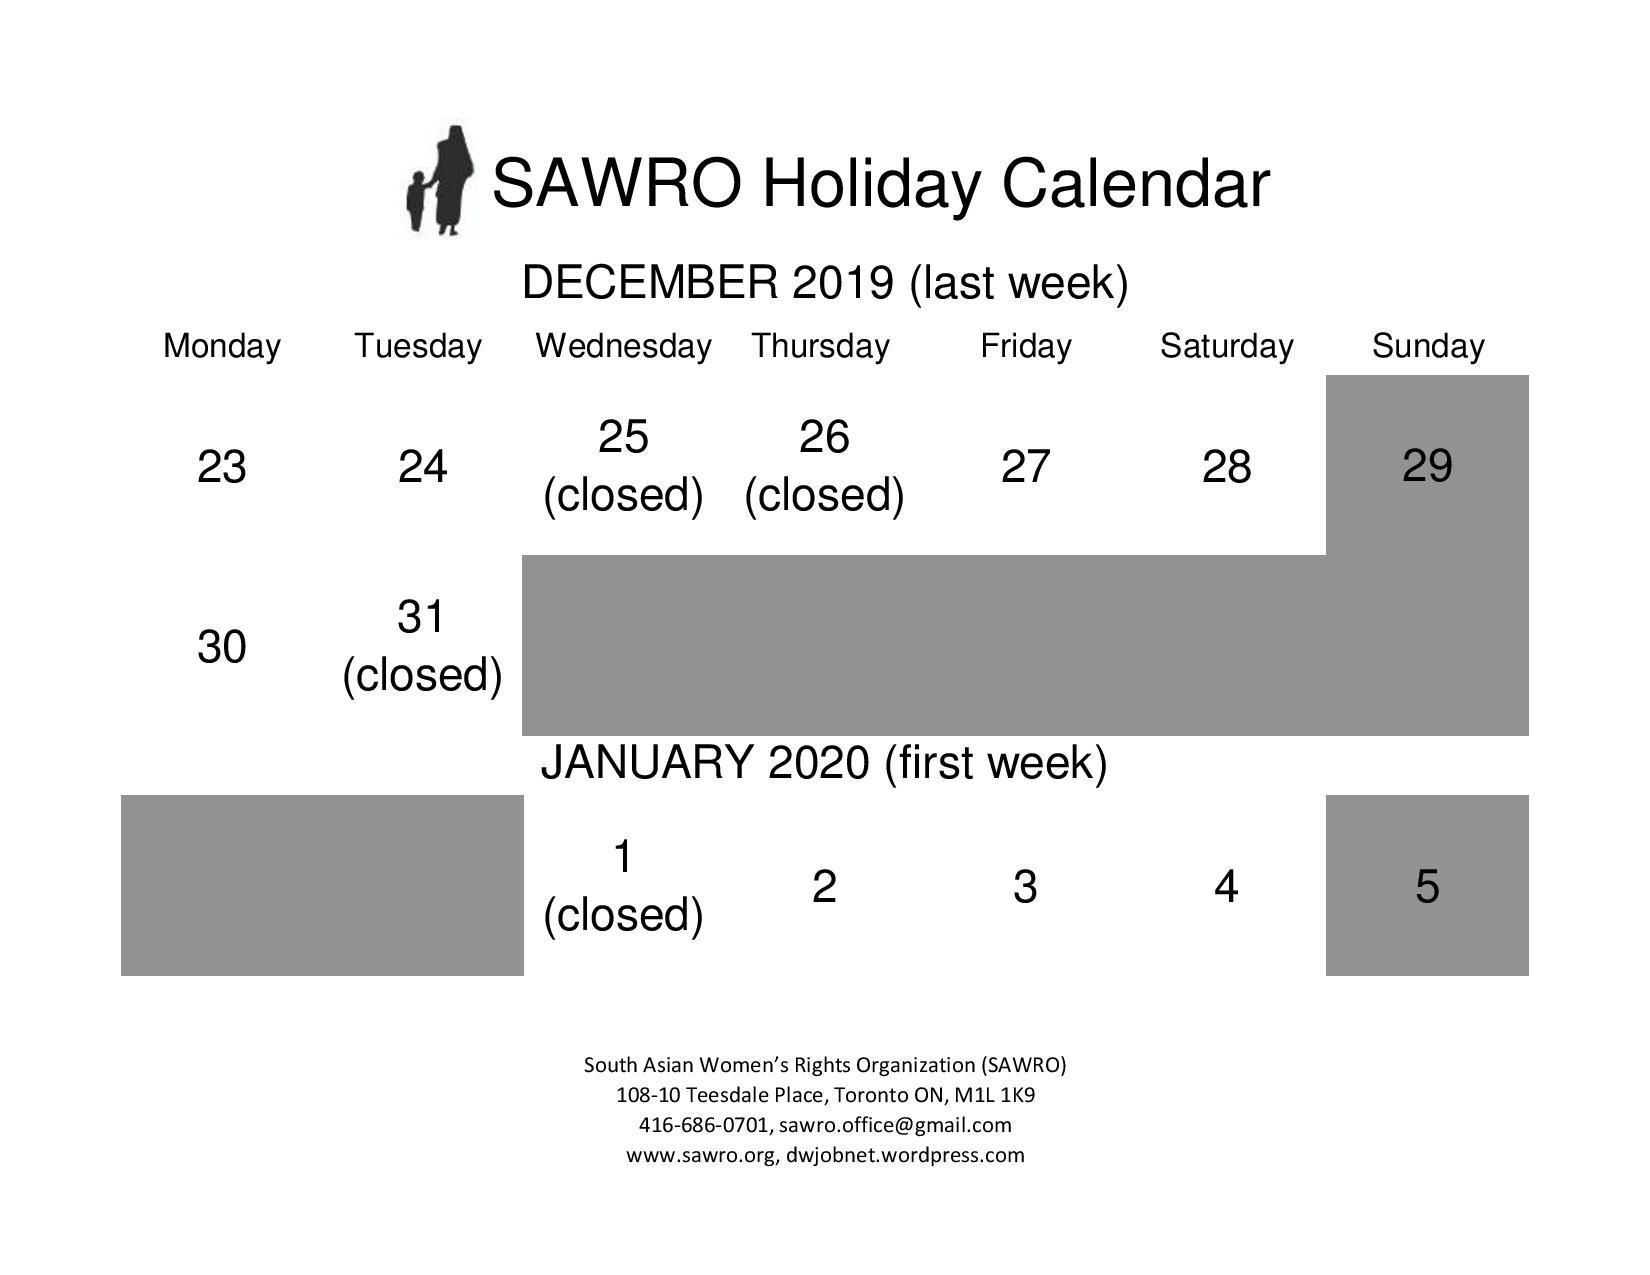 SAWRO Holiday Calendar!